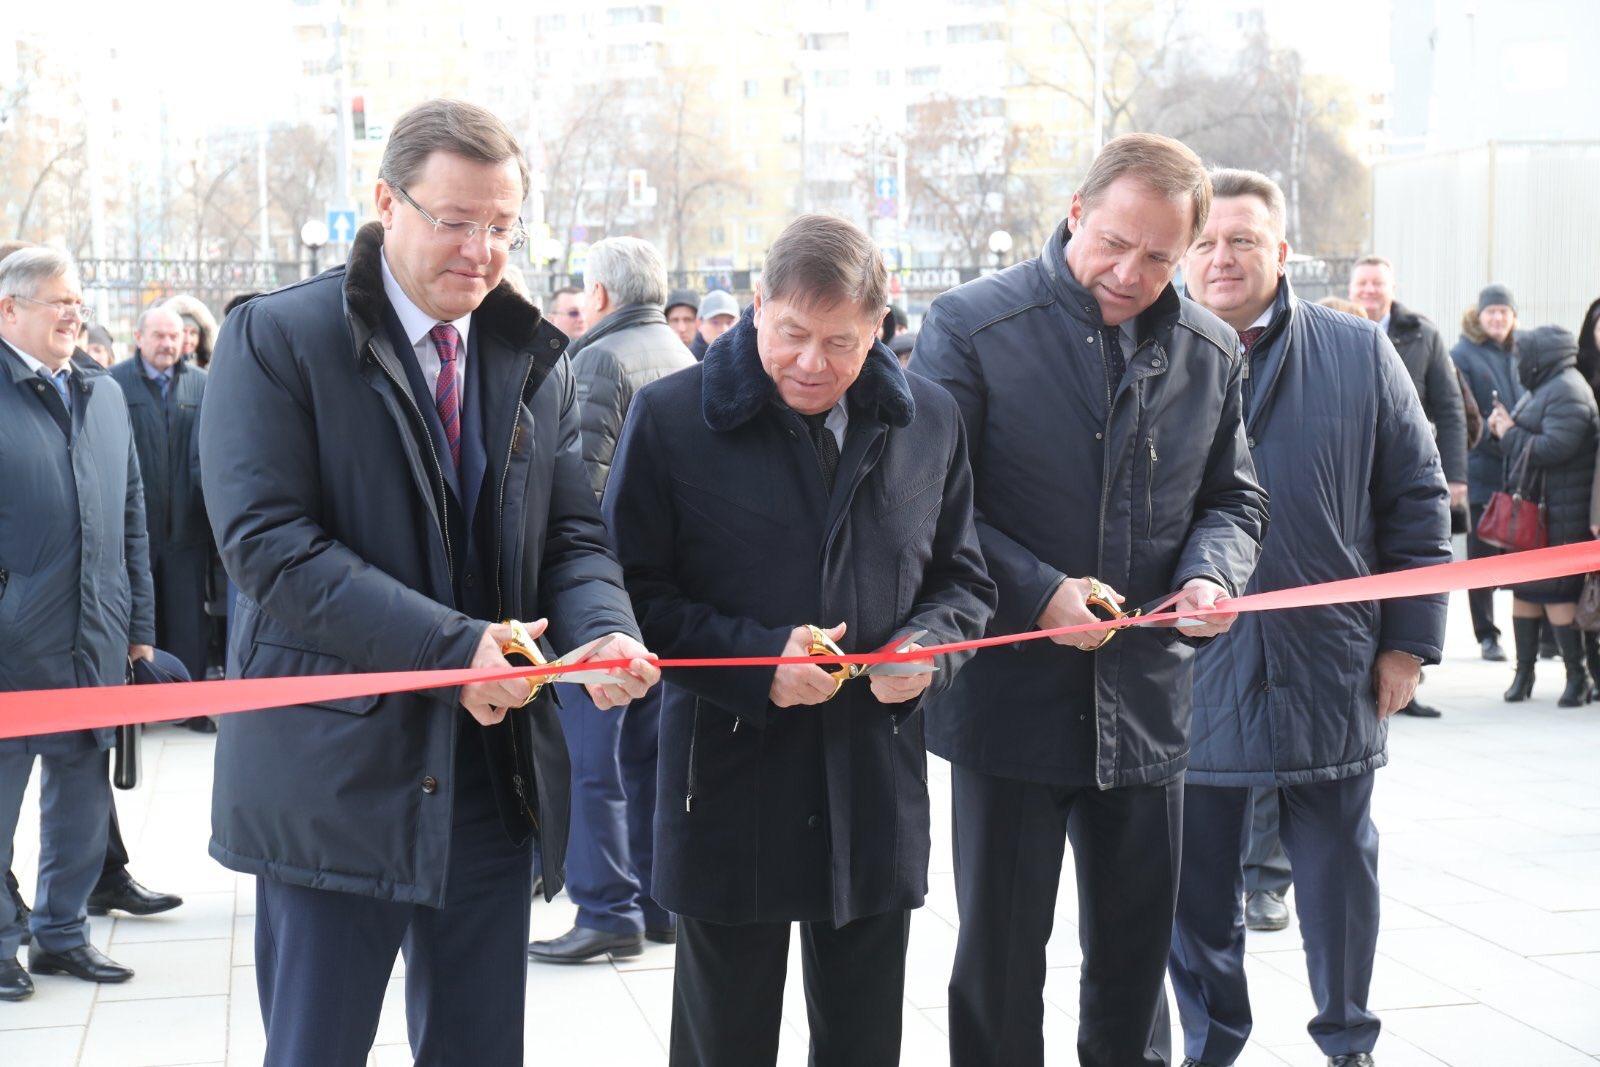 Слева направо: губернатор Дмитрий Азаров, Вячеслав Лебедев, полпред президента в ПФО Игорь Комаров